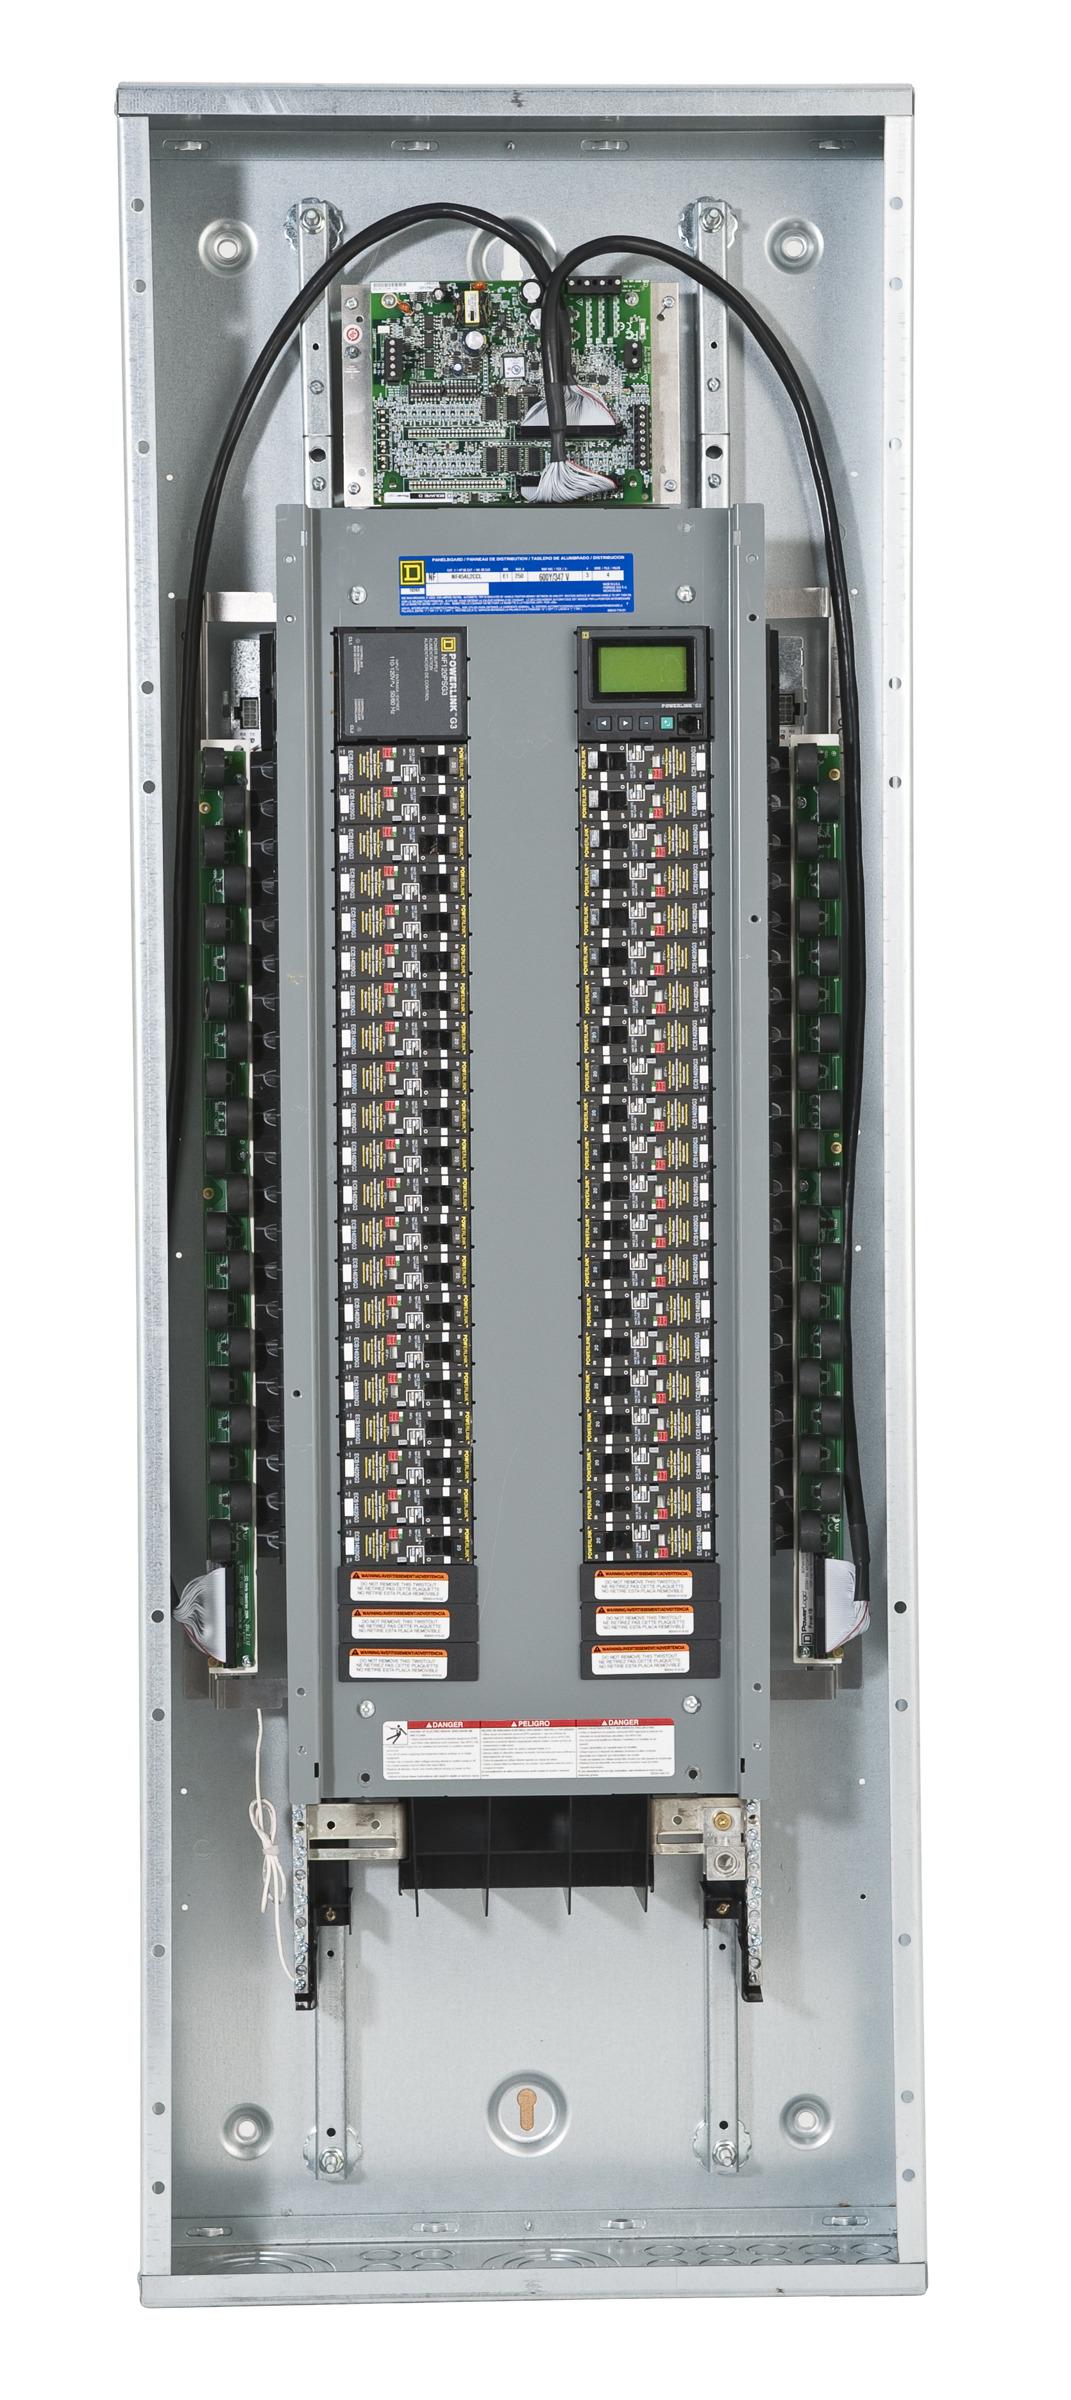 Powerlink EM Intelligent Lighting Panel ...  sc 1 st  Lighting Controls Association & Powerlink EM Intelligent Lighting Panel by Schneider Electric azcodes.com